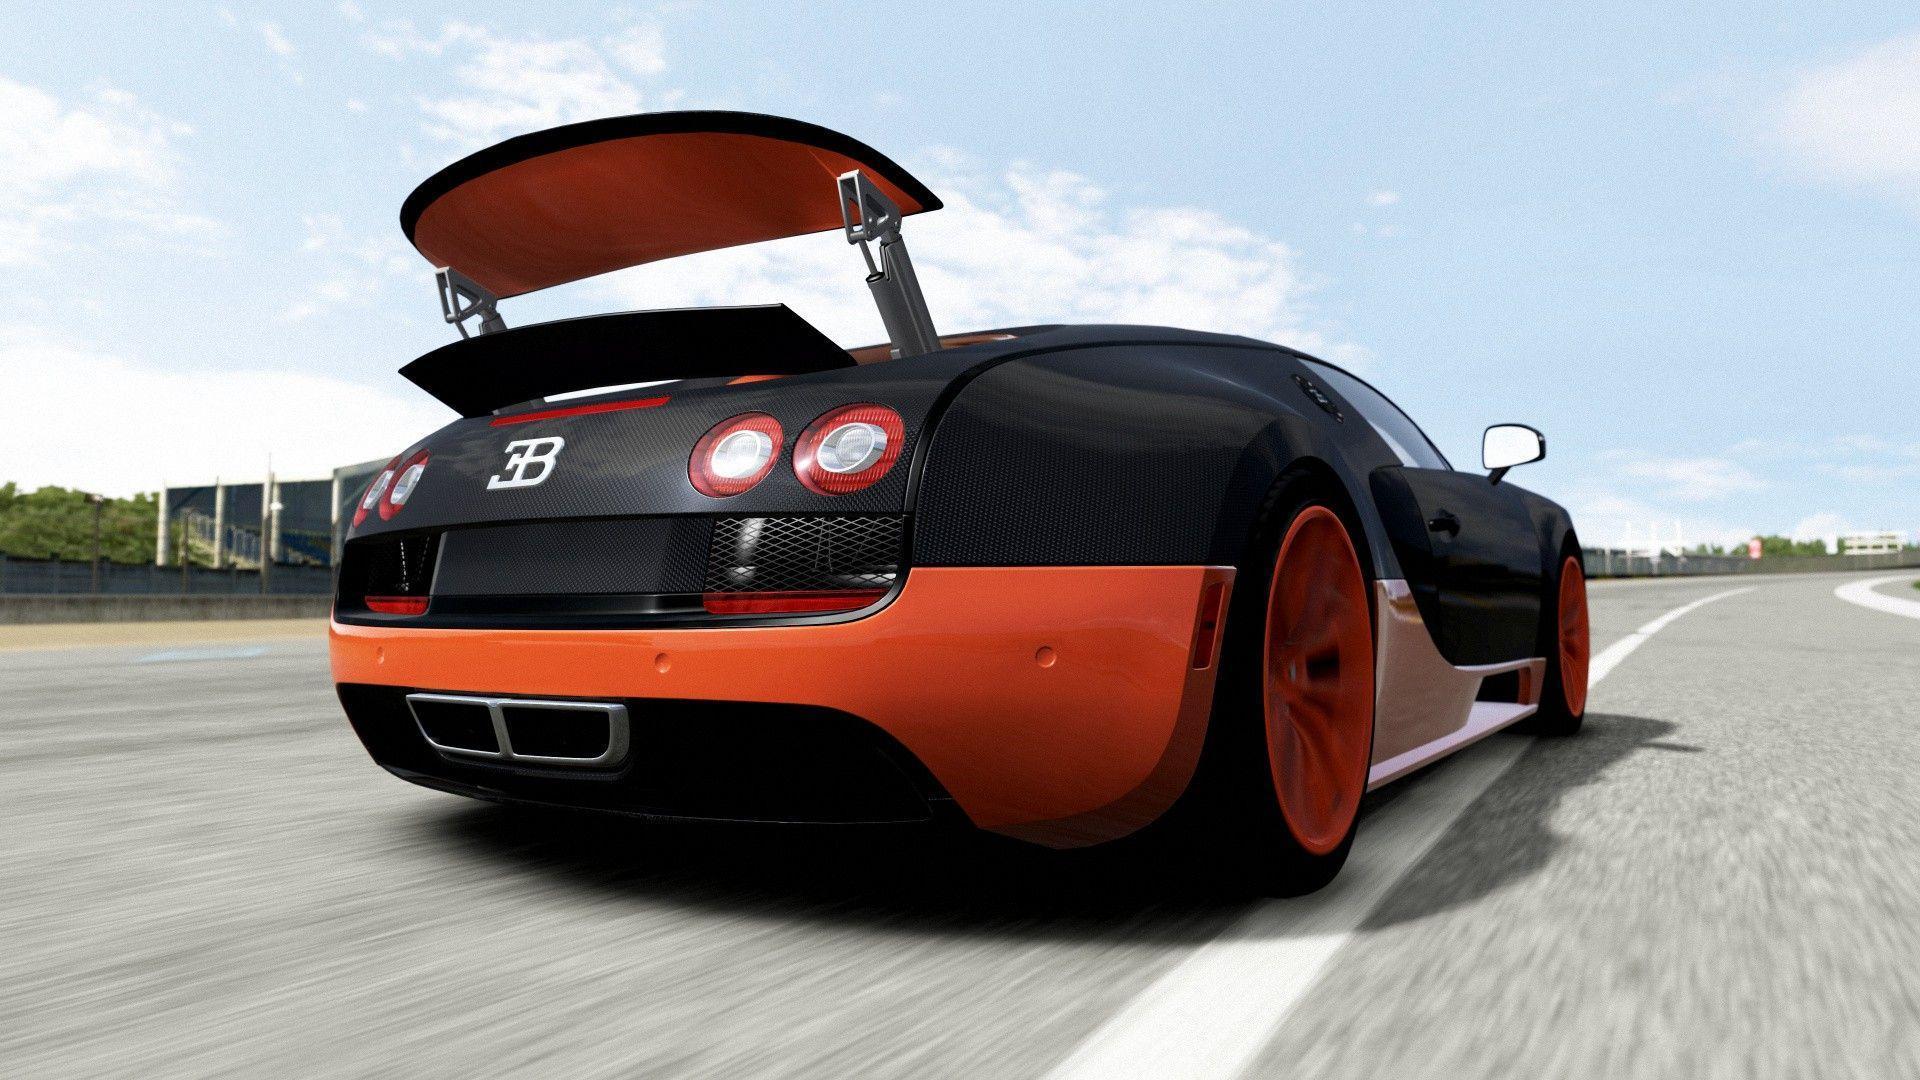 bugatti veyron super sport wallpaper cool hd taboratcom - Bugatti Veyron Super Sport Top Gear Wallpaper